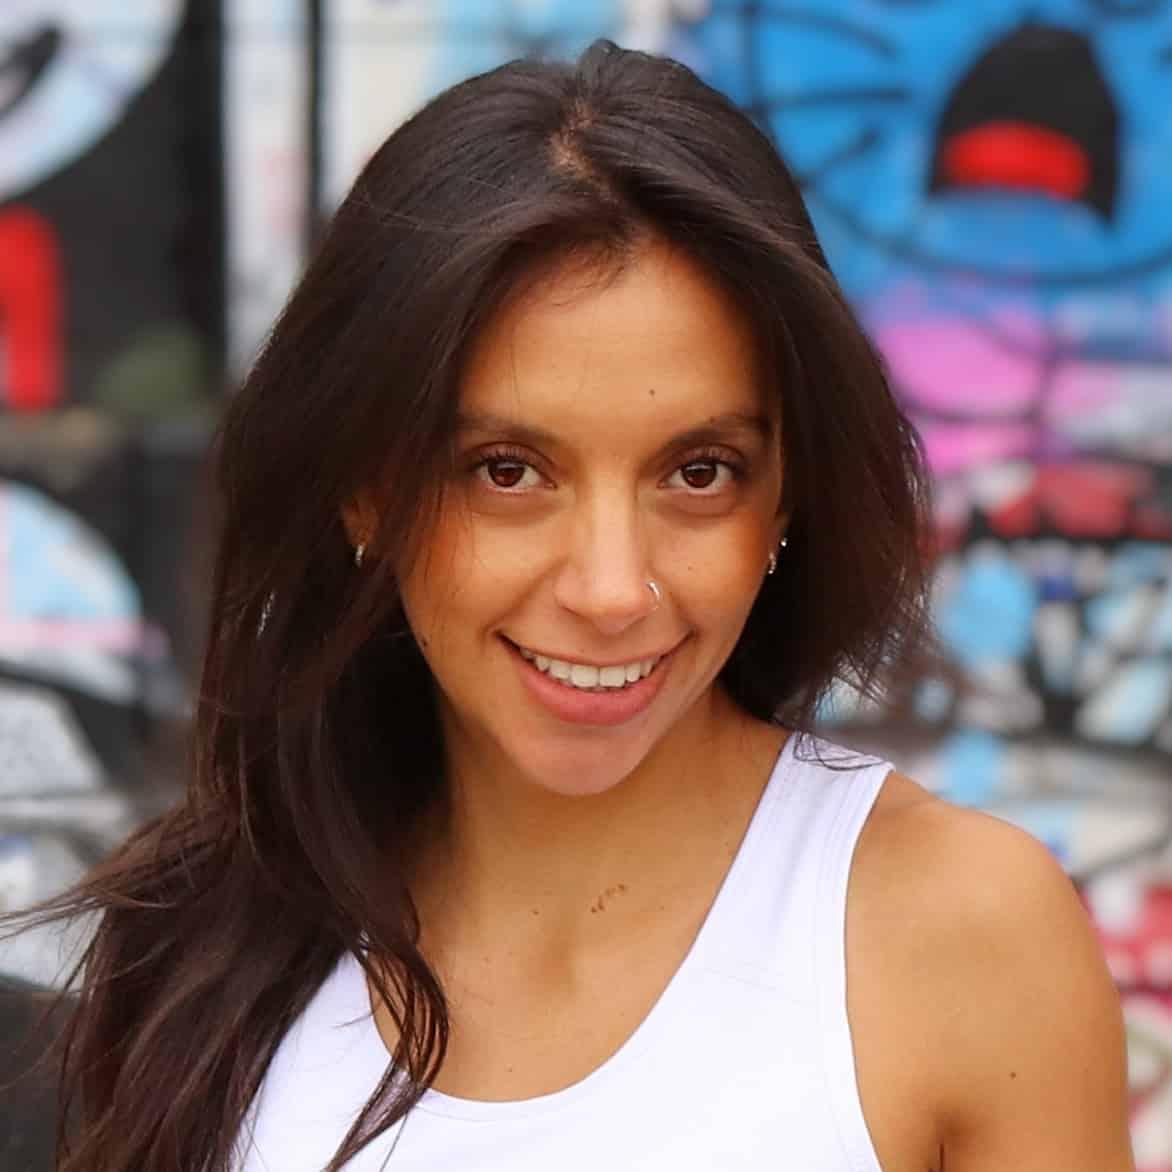 Maria Paz